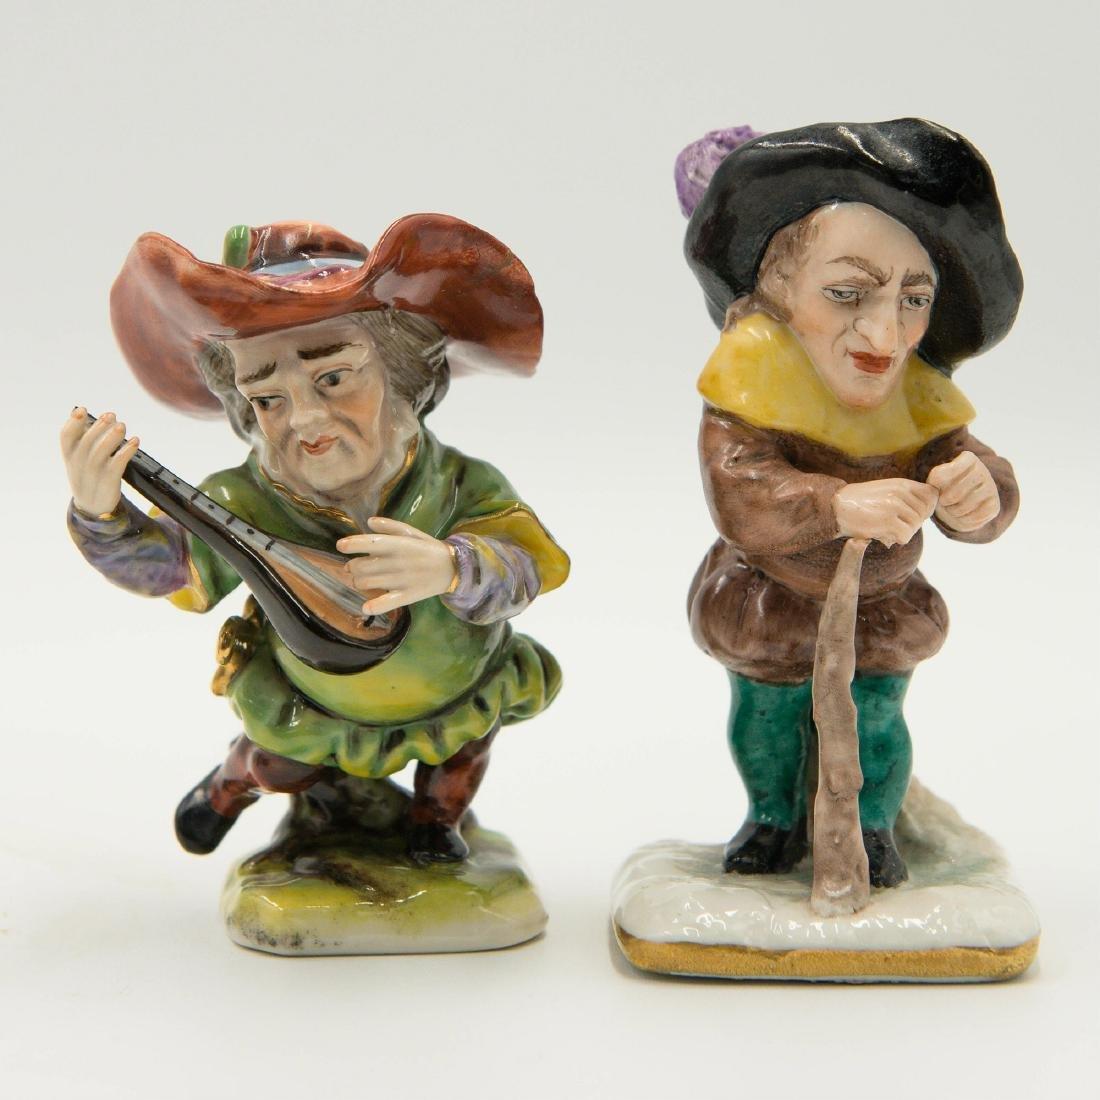 Capodimonte Porcelain Group of 4 Gnomes Dwarfs - 4